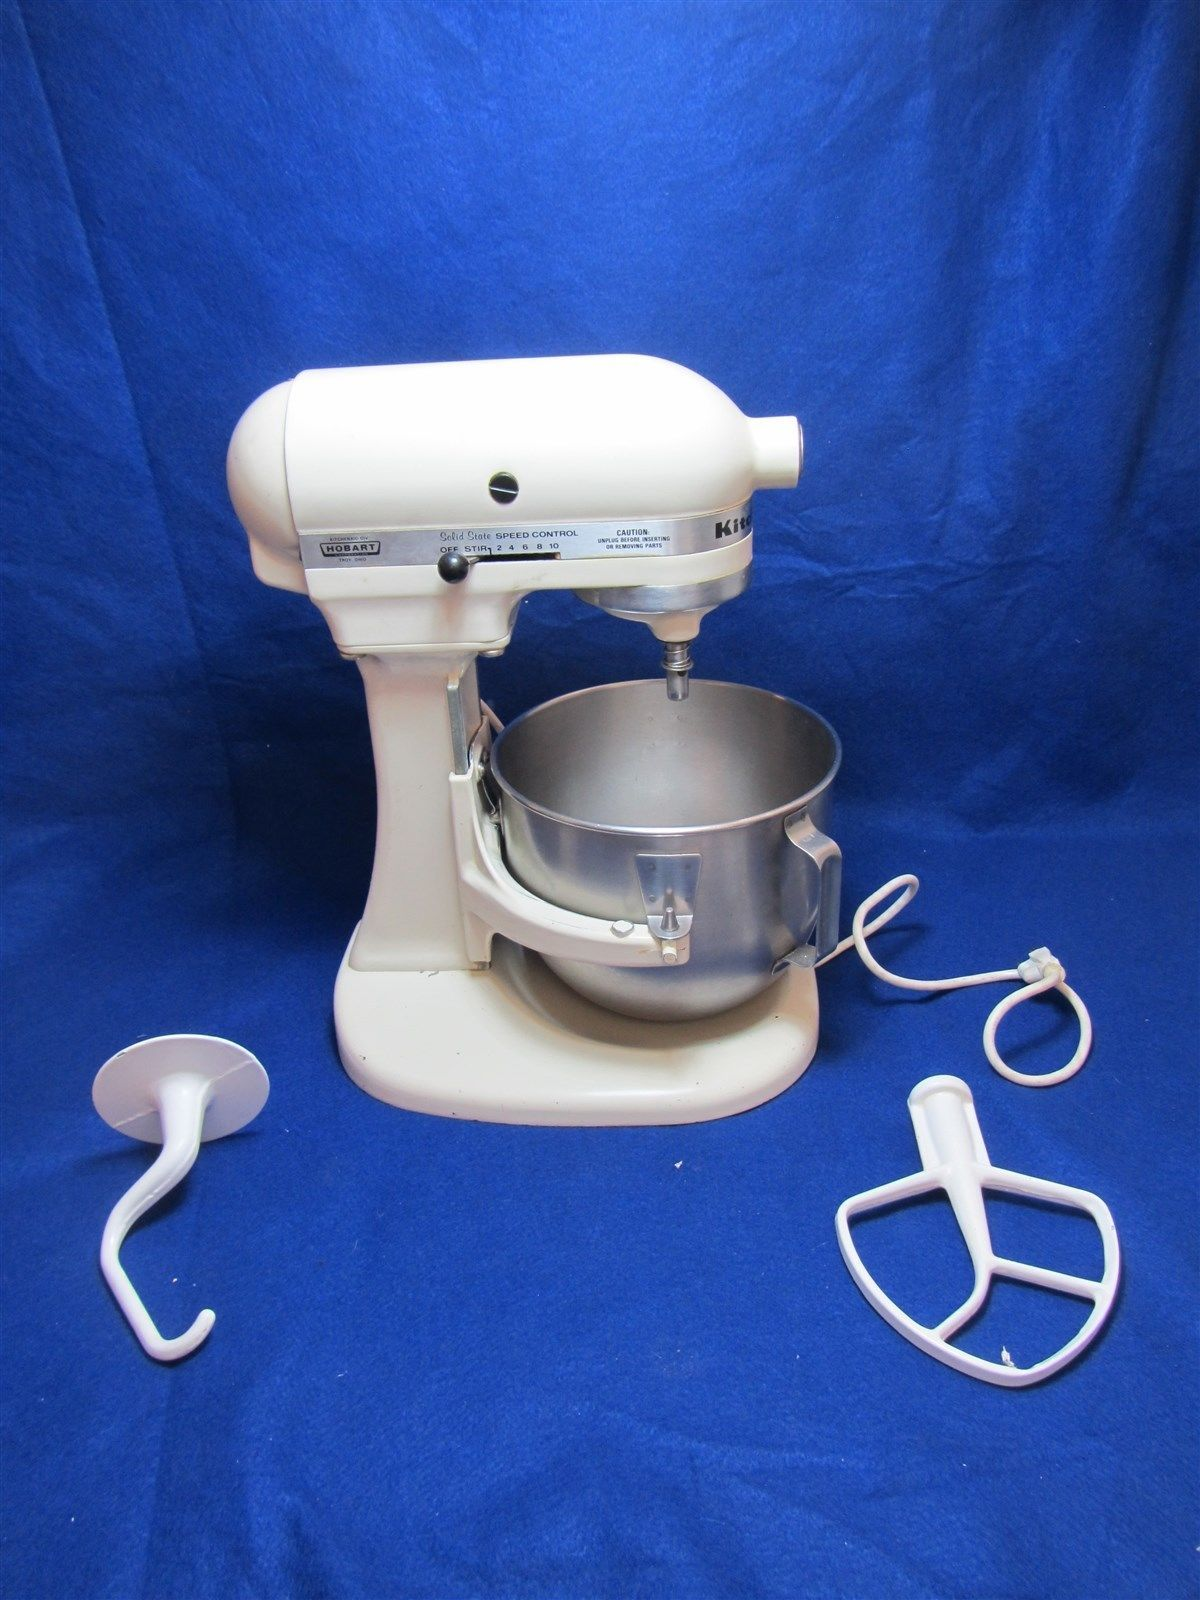 KitchenAid Hobart K5SS White Countertop Mixer w/ Bowl & Accessories Attachments https://t.co/QBqK5zBPGu https://t.co/bk0MgqqKkG